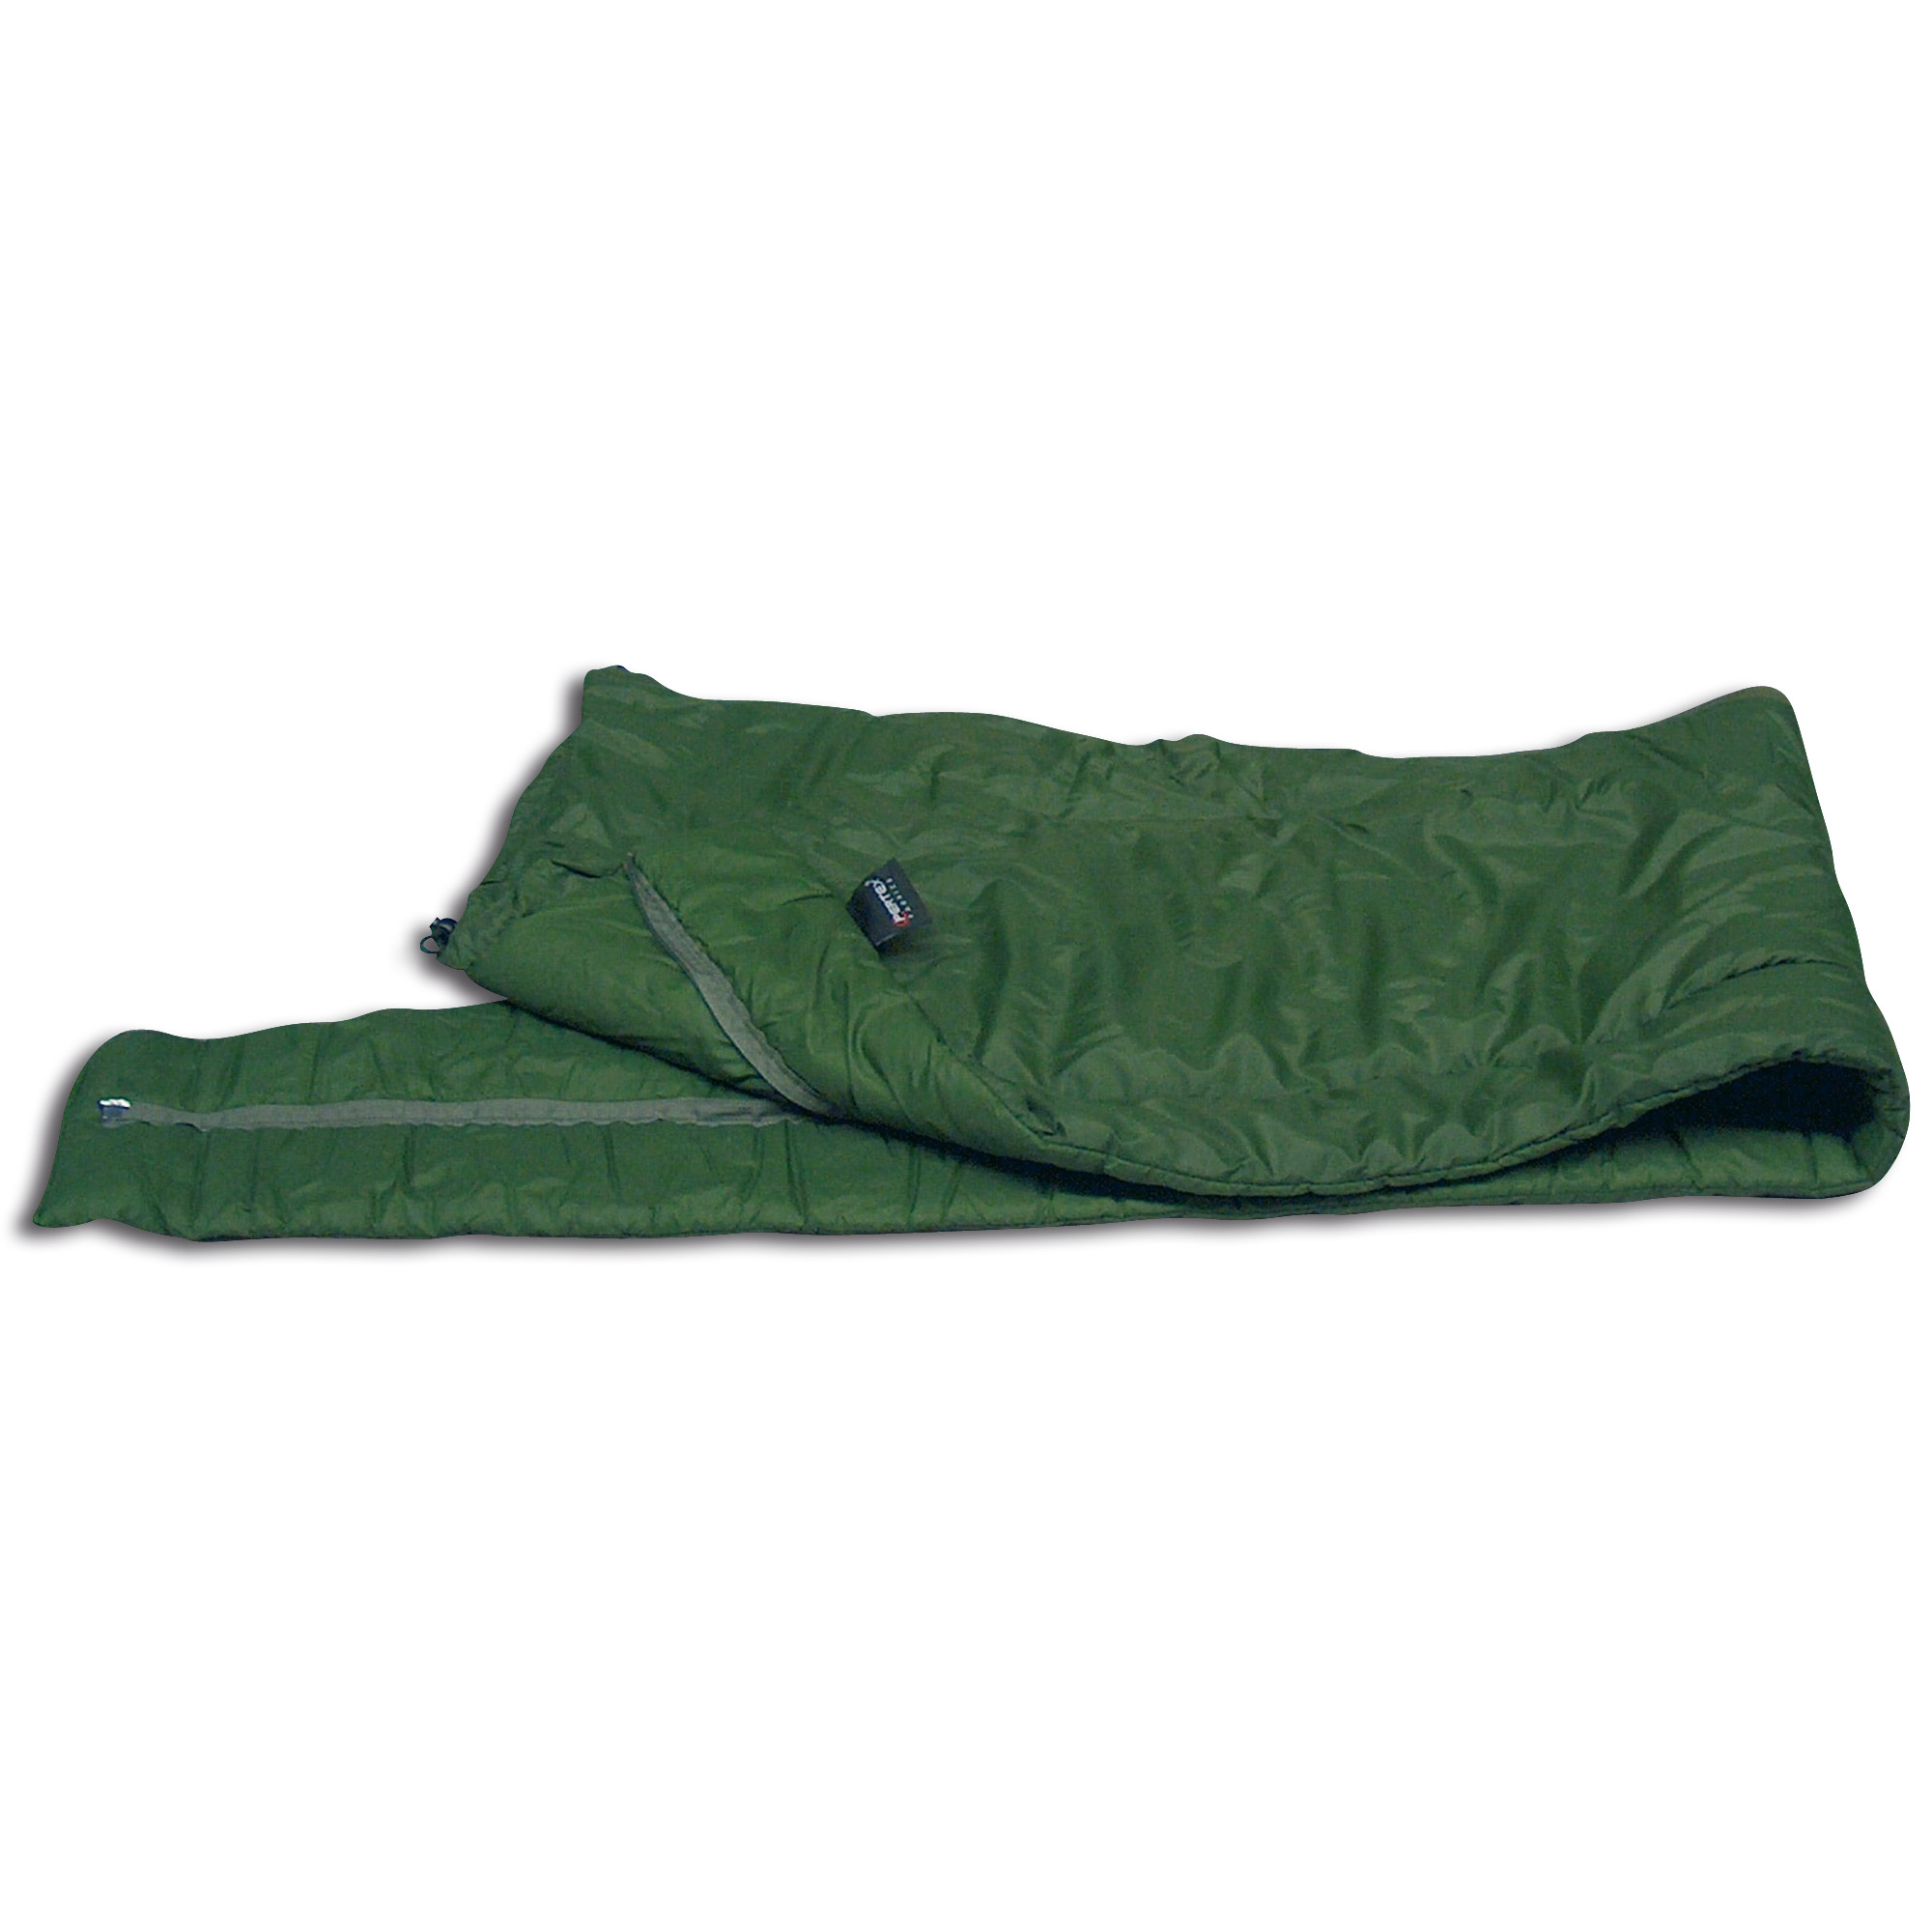 Saco de dormir Extender Softie verde oliva